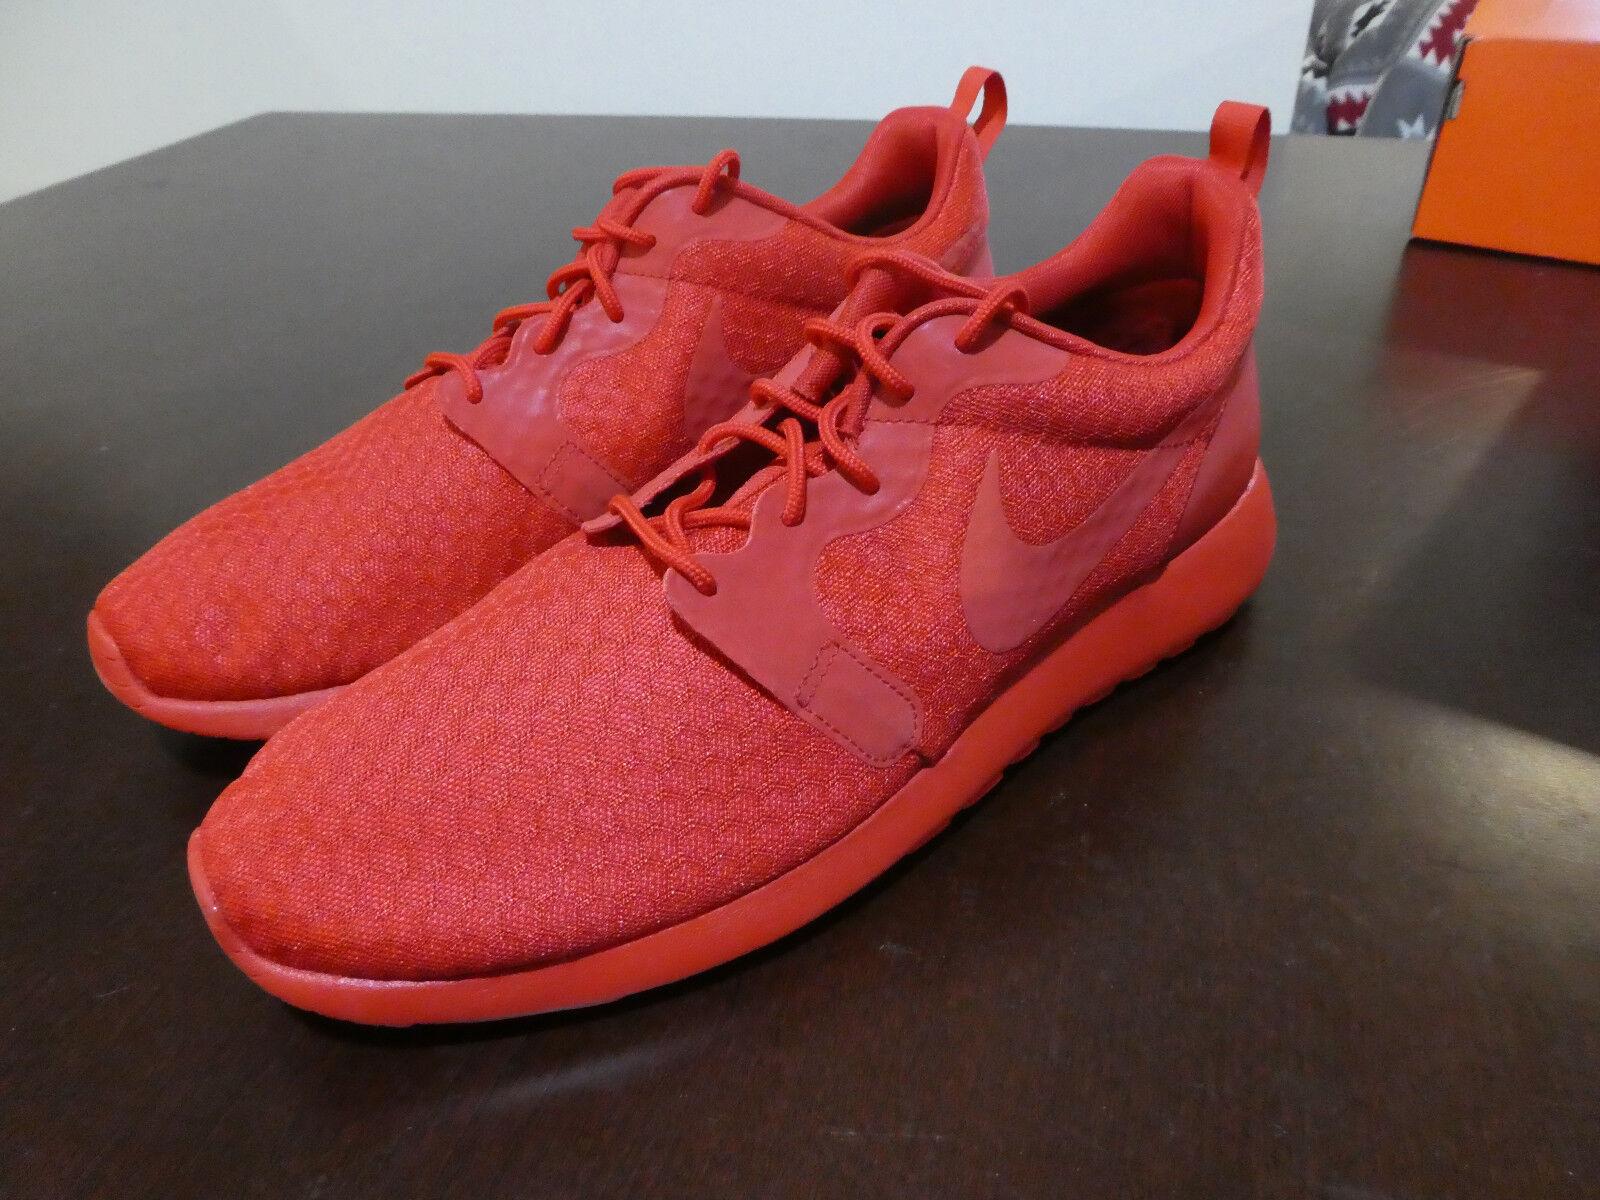 Nike Roshe Run HYP shoes mens new sneakers 636220 004 660 Rosherun one Hype red